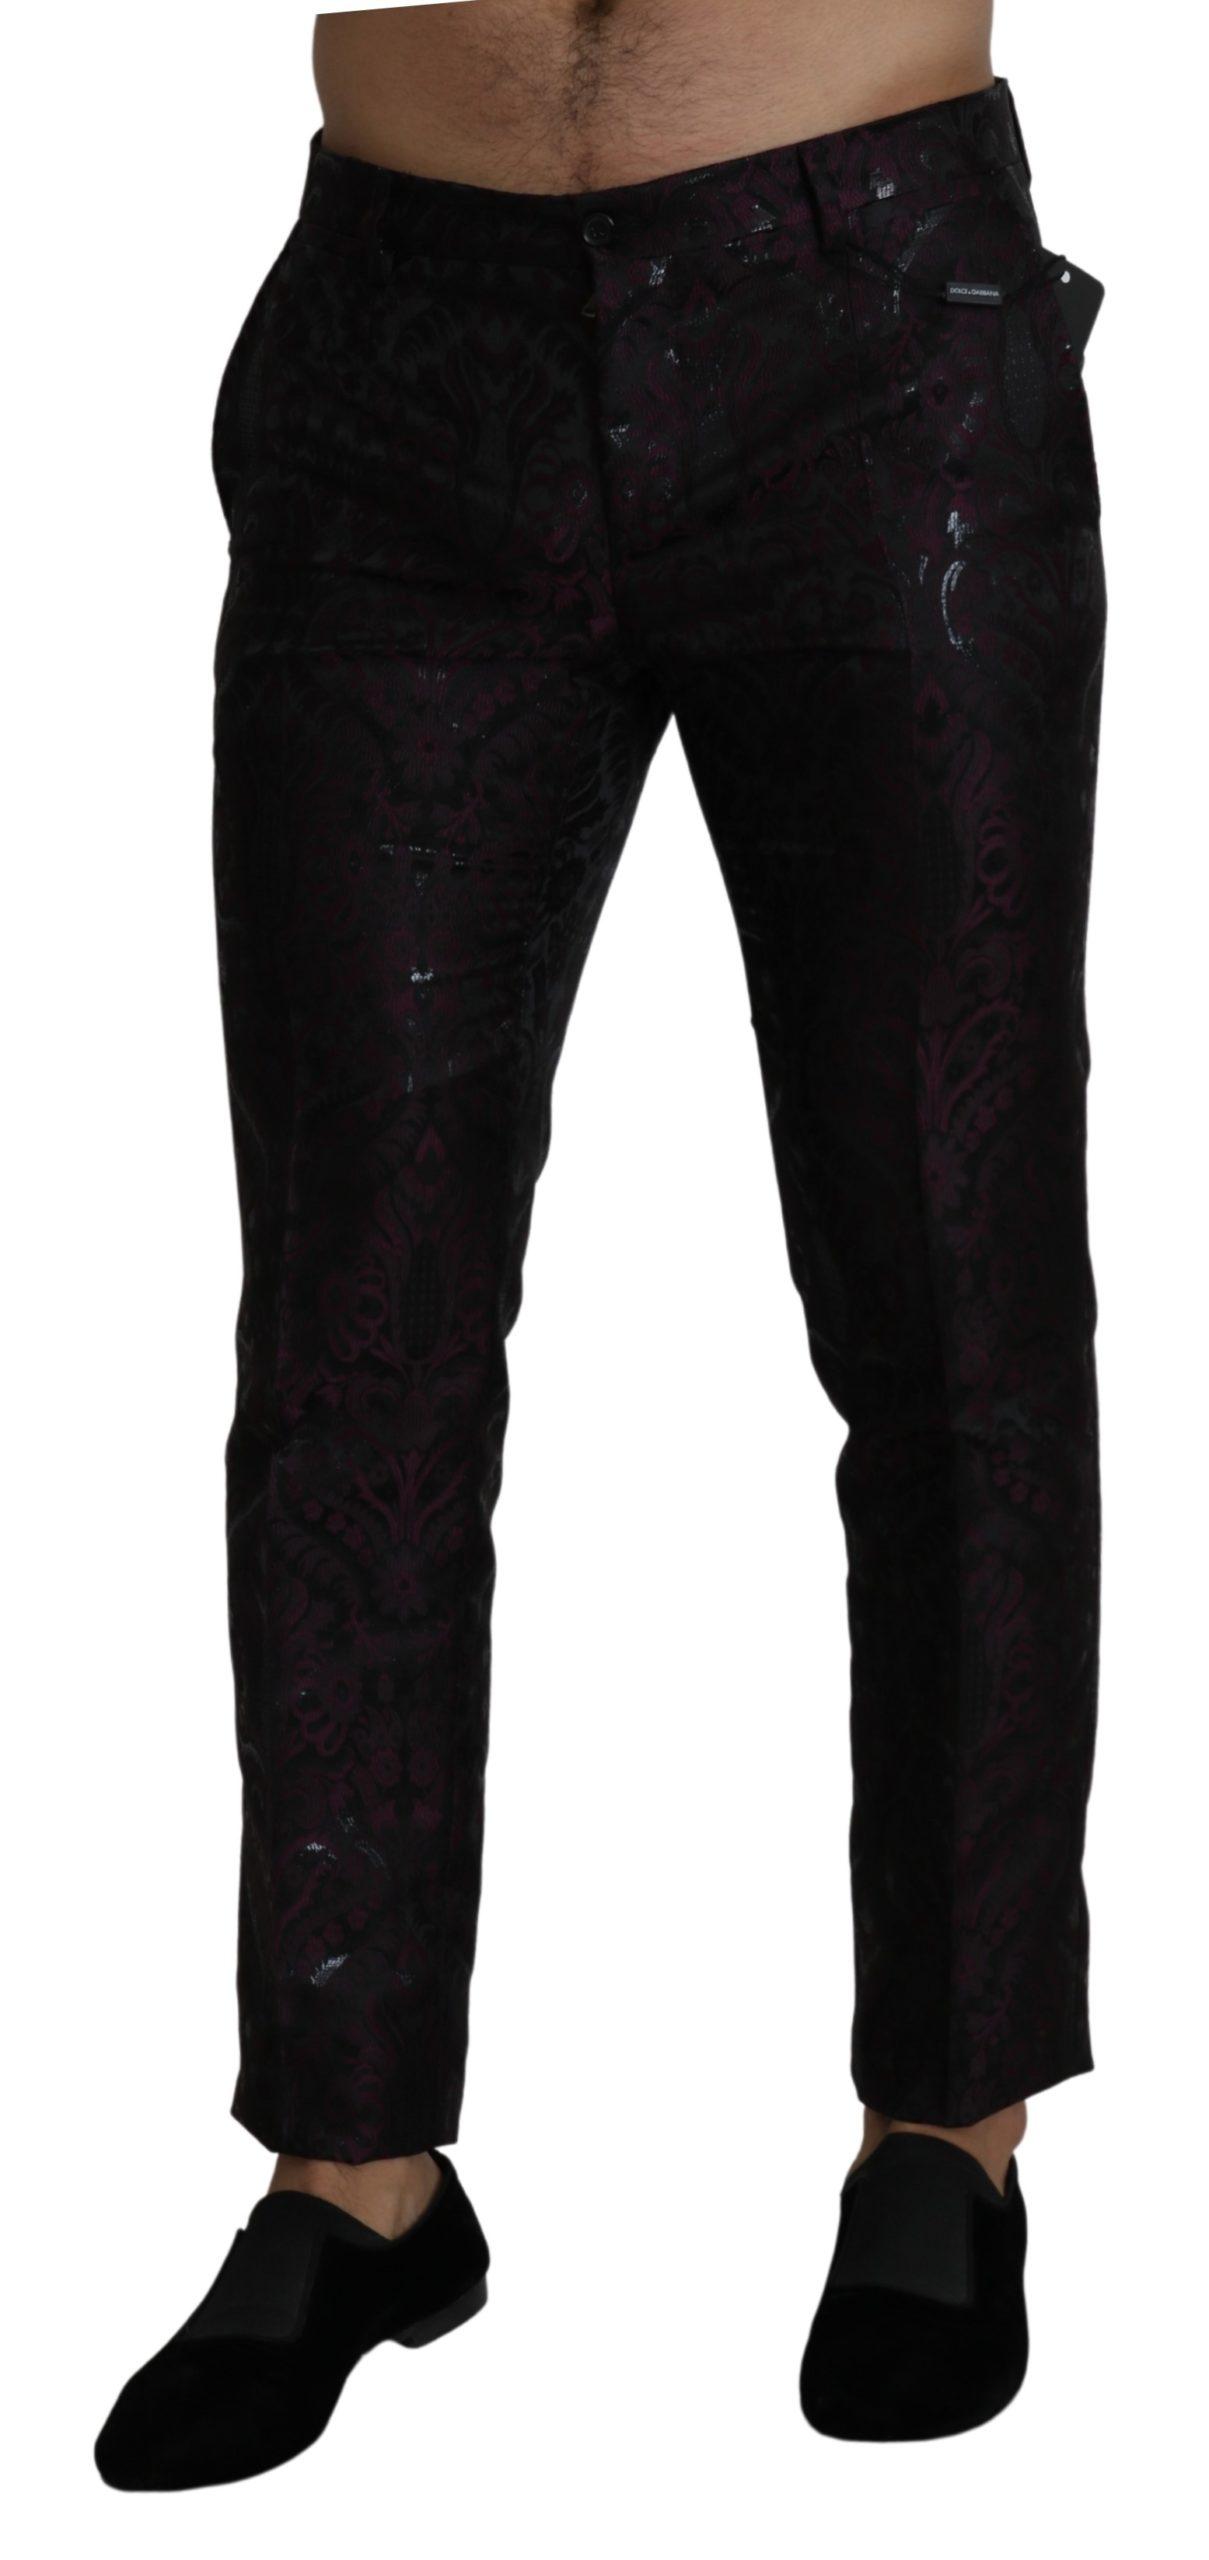 Dolce & Gabbana Men's Jacquard Dress Slim Trouser Bordeaux PAN71399 - IT48 | M